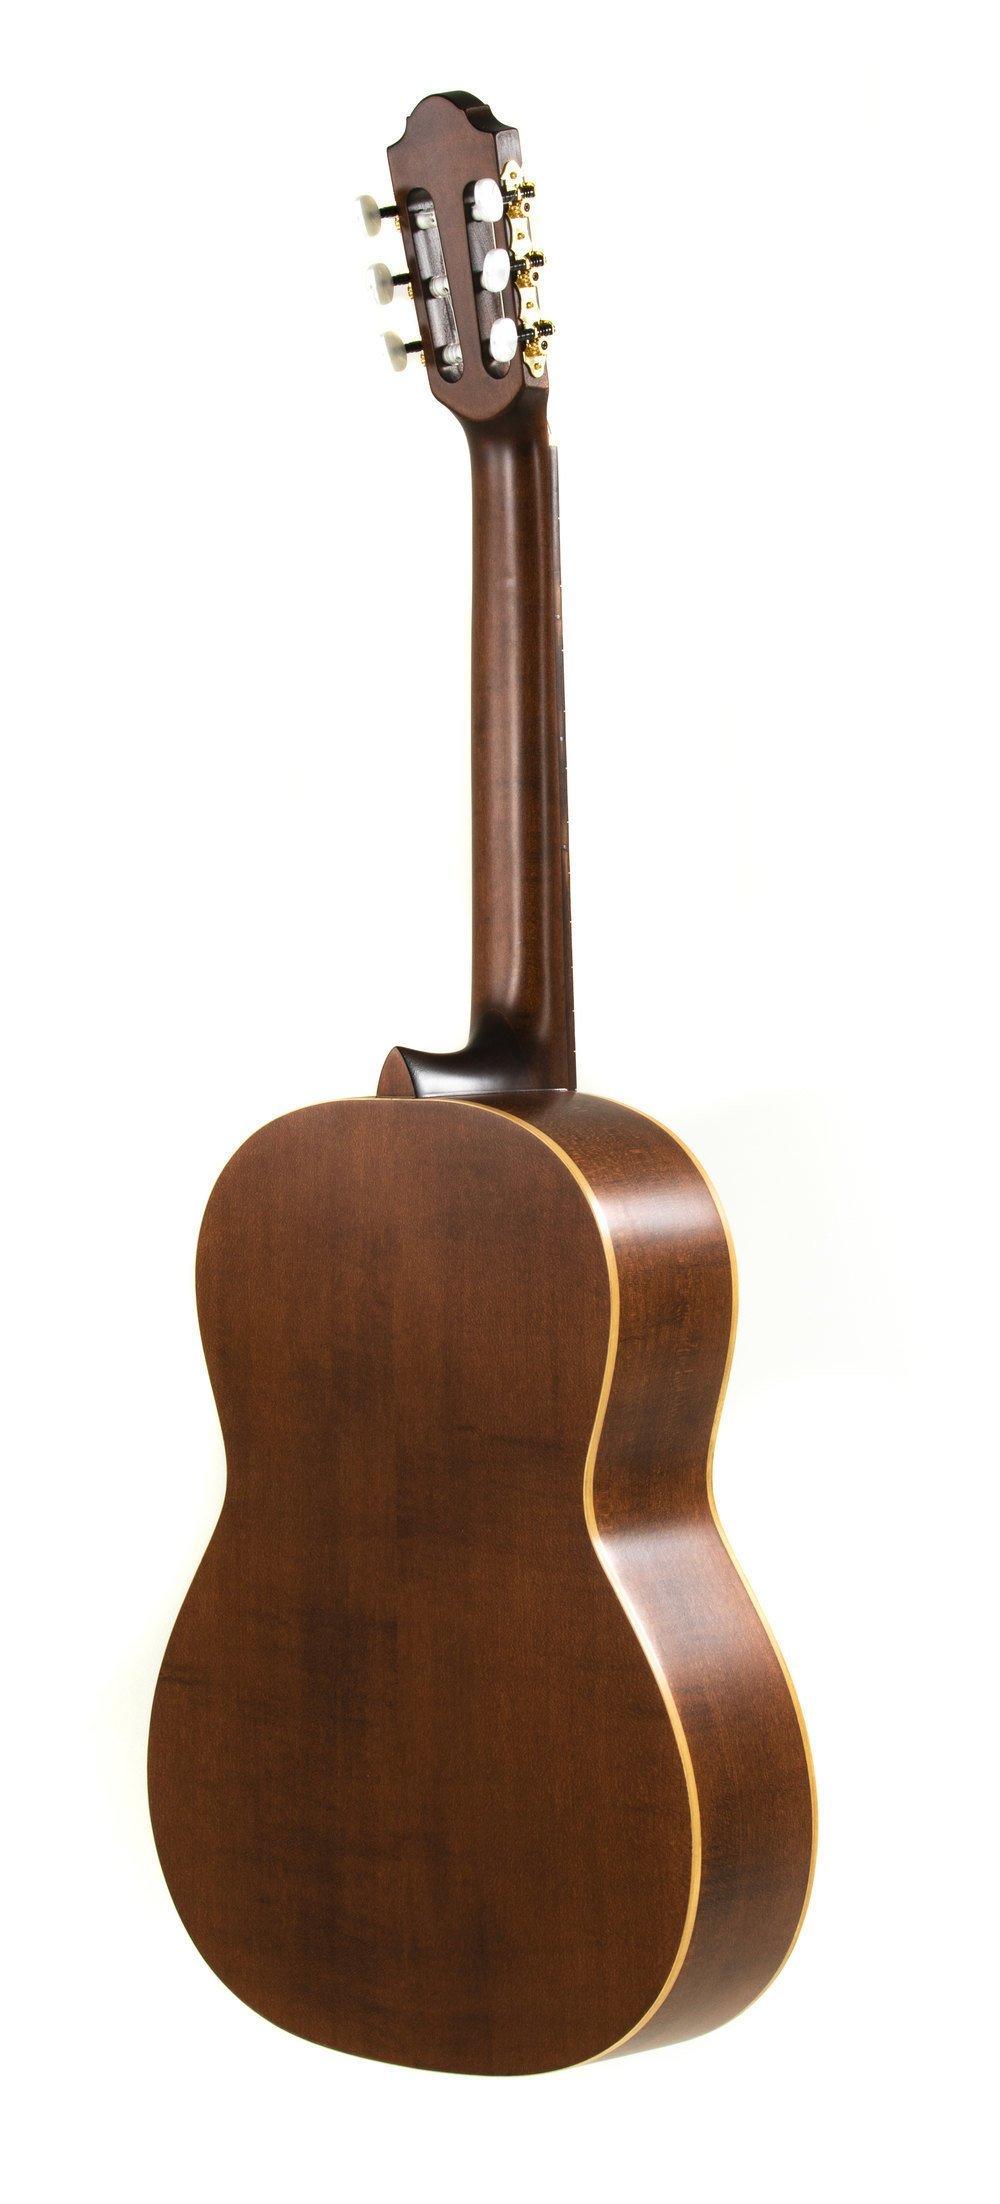 GEWA Konzertgitarre Pro Arte GC-Antique